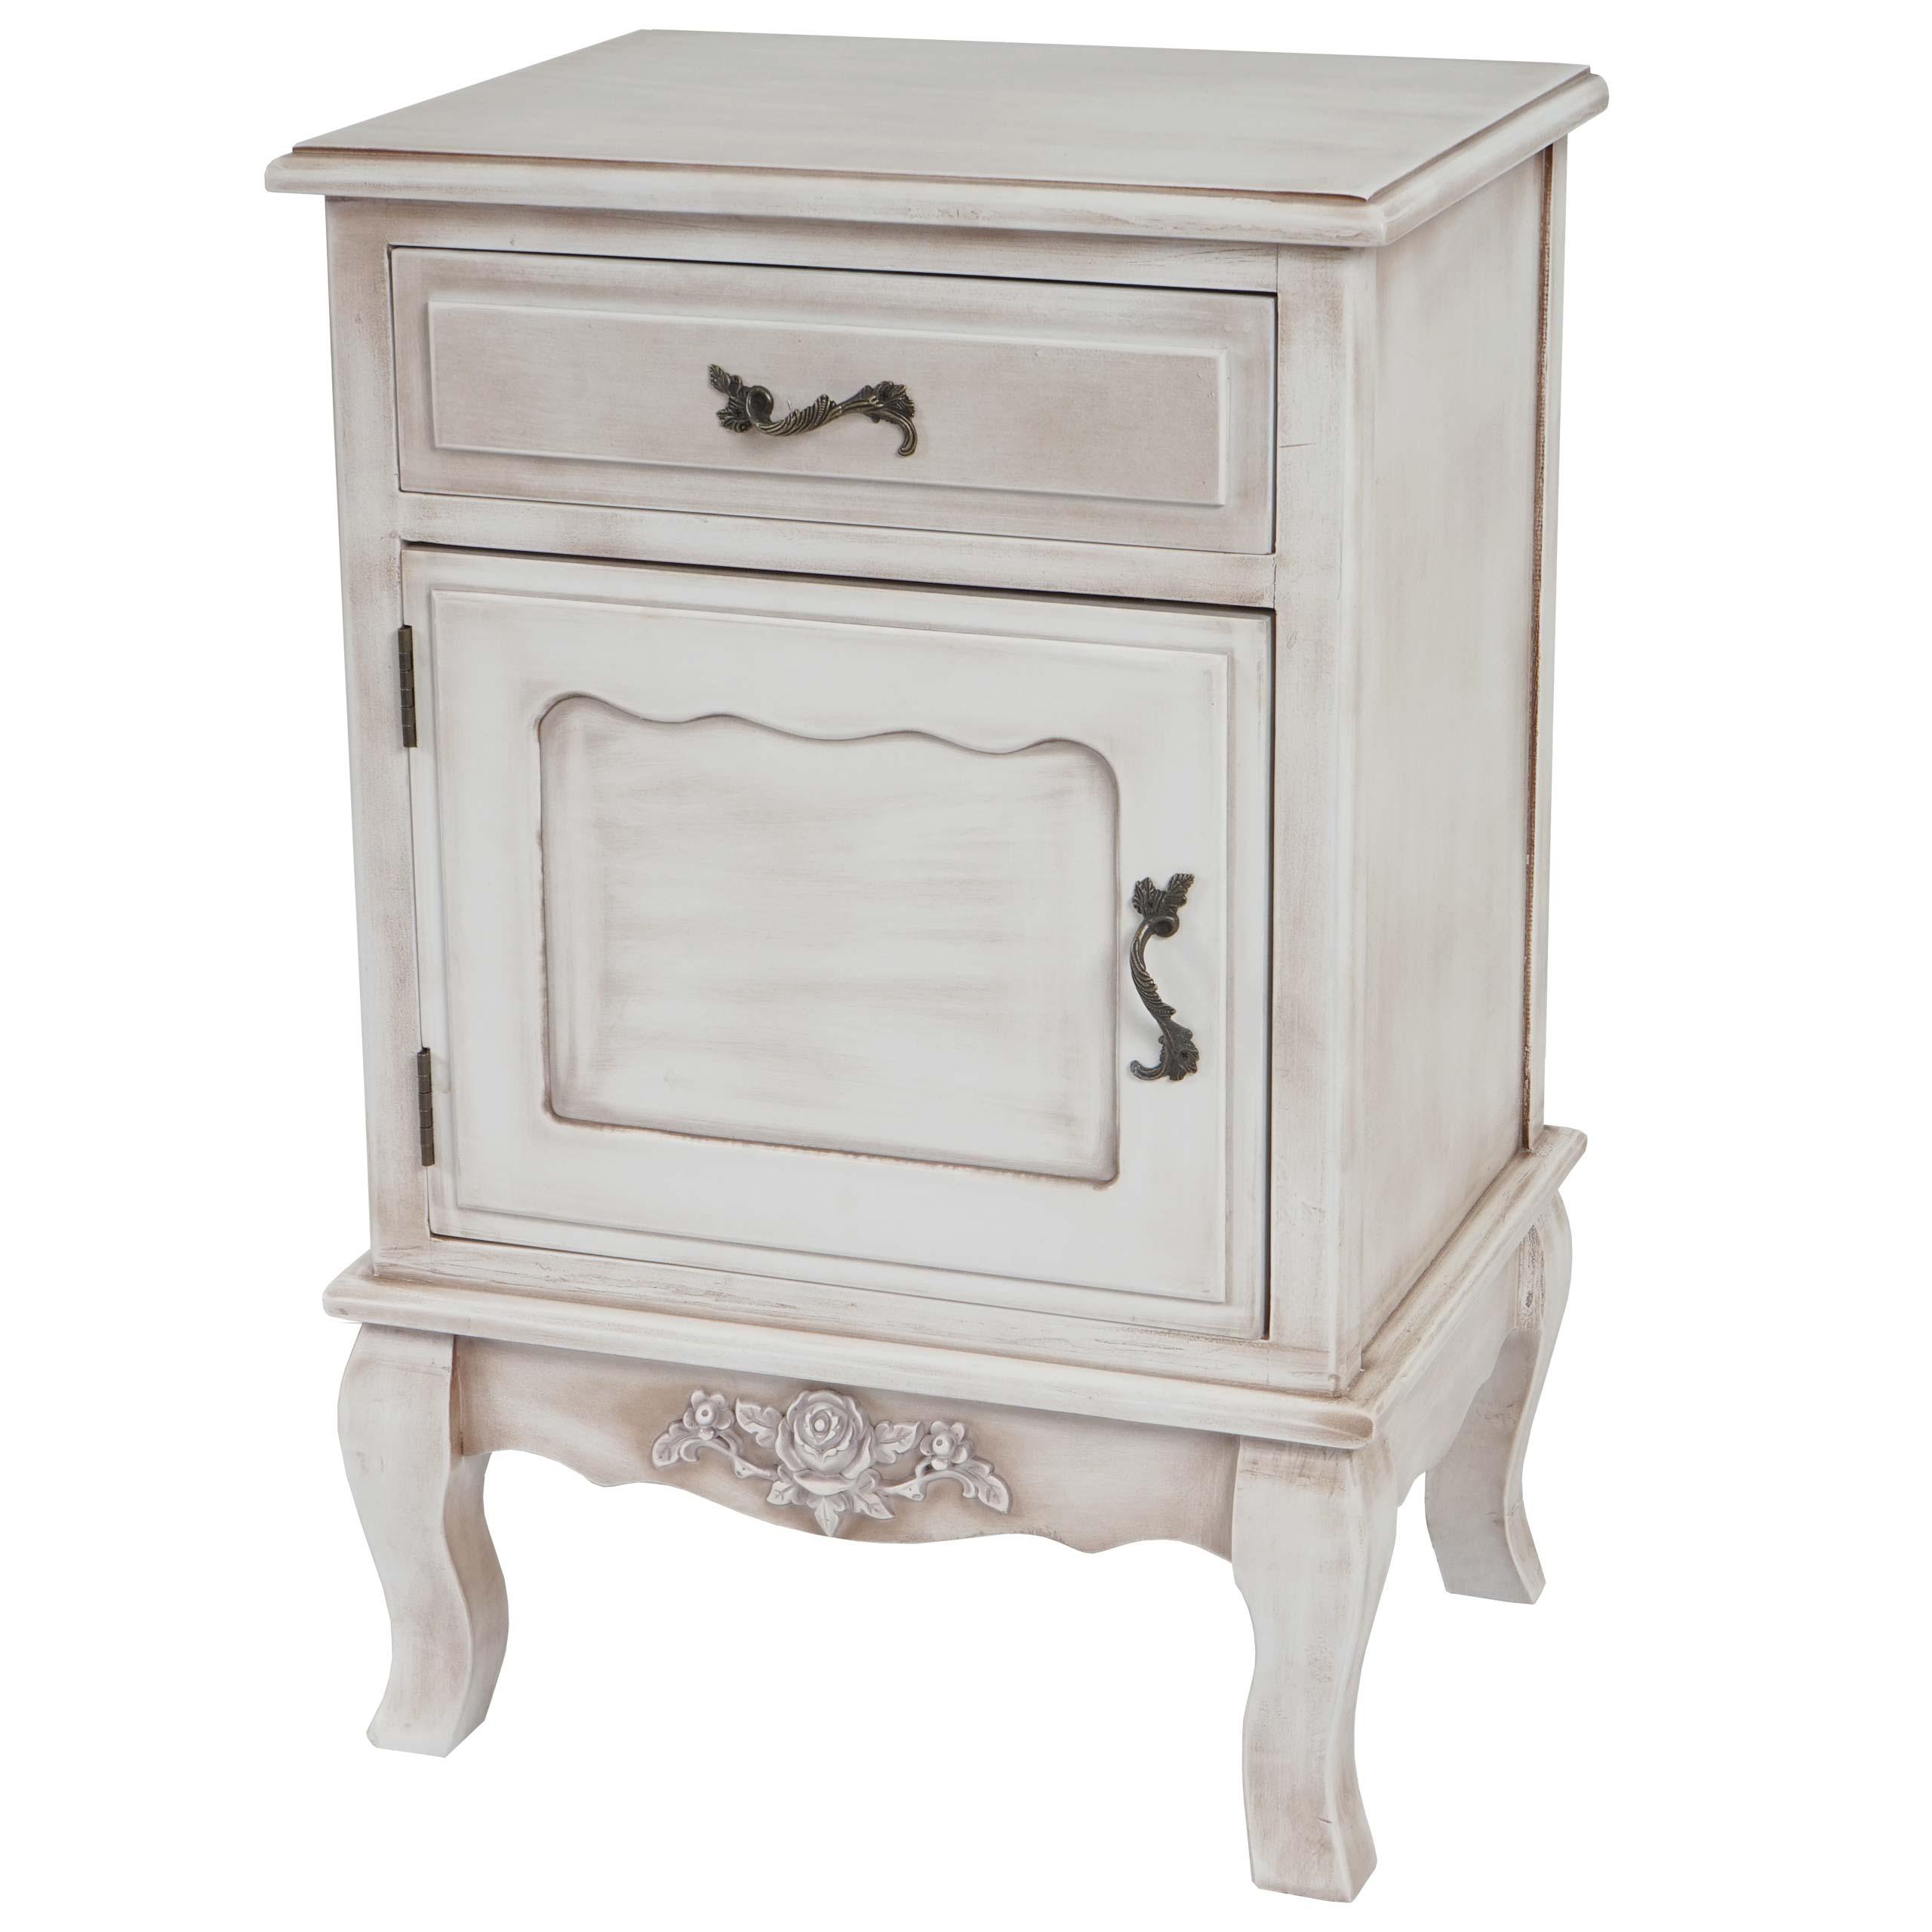 kommode valence h432 barock antik 69x46x36cm wei antik schrank nachttisch ebay. Black Bedroom Furniture Sets. Home Design Ideas